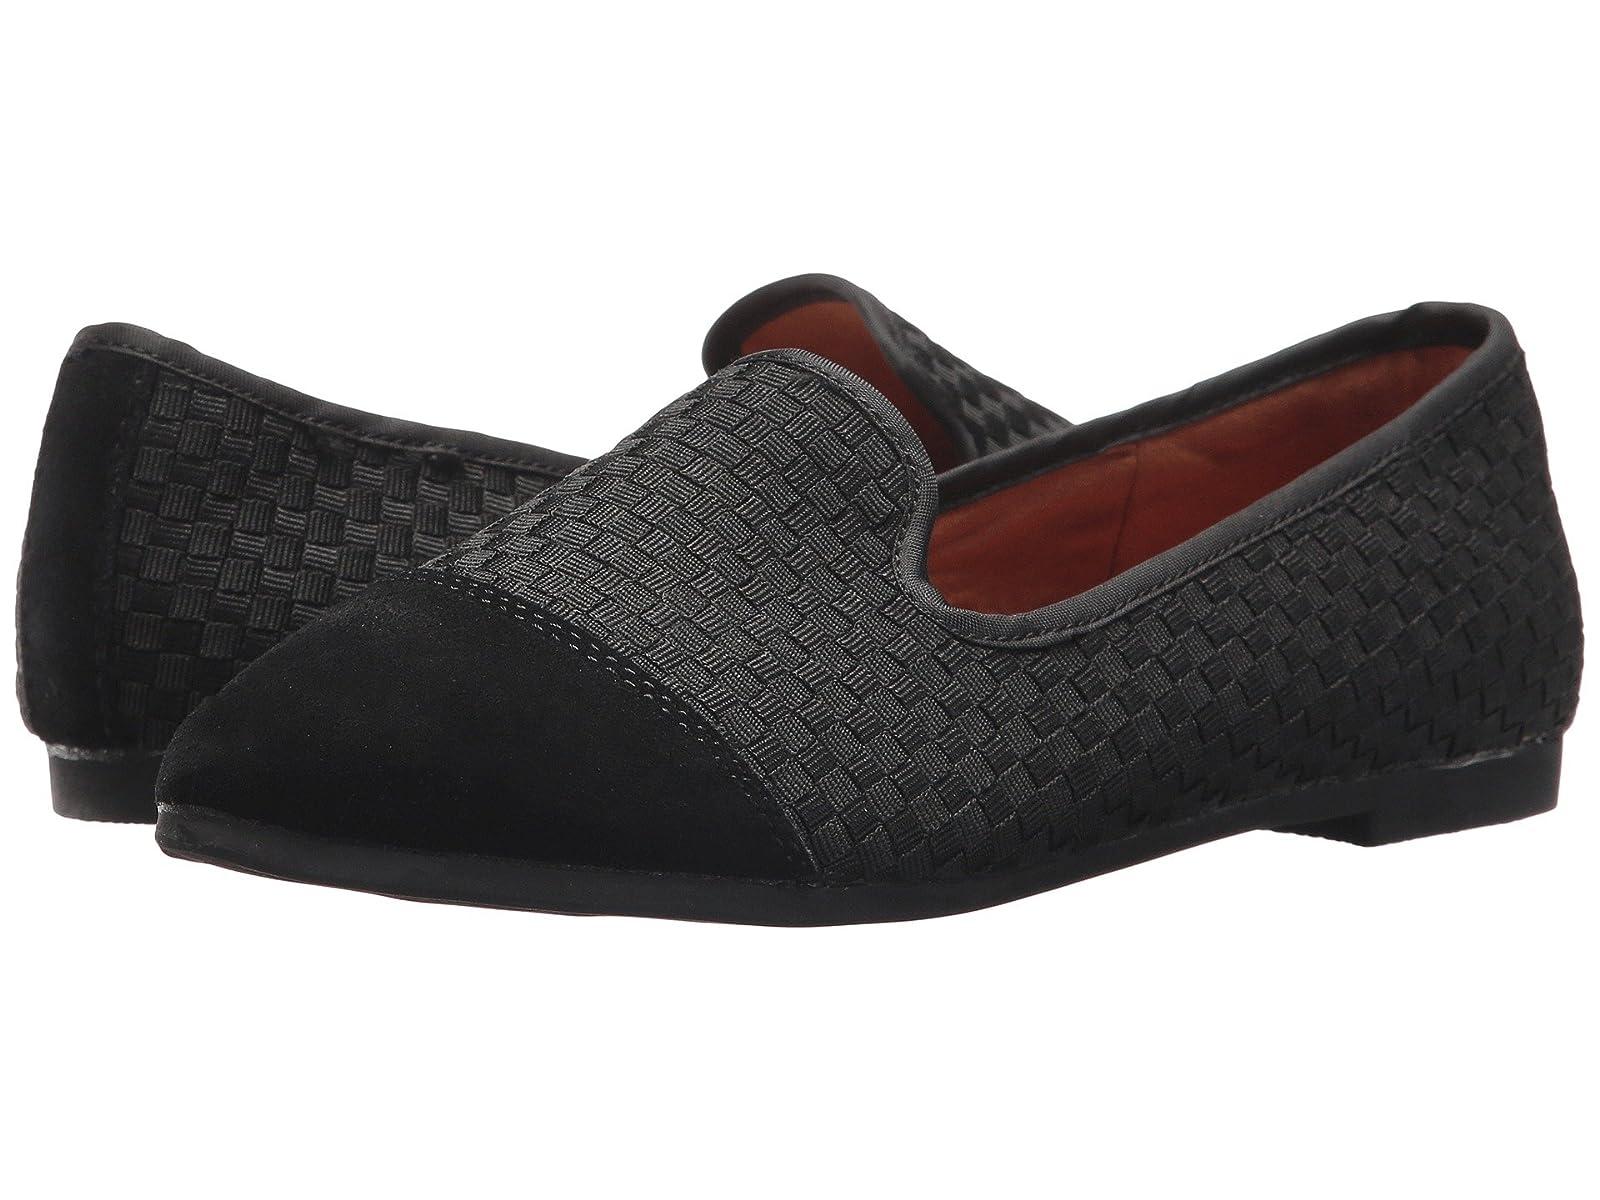 bernie mev. DanilaCheap and distinctive eye-catching shoes